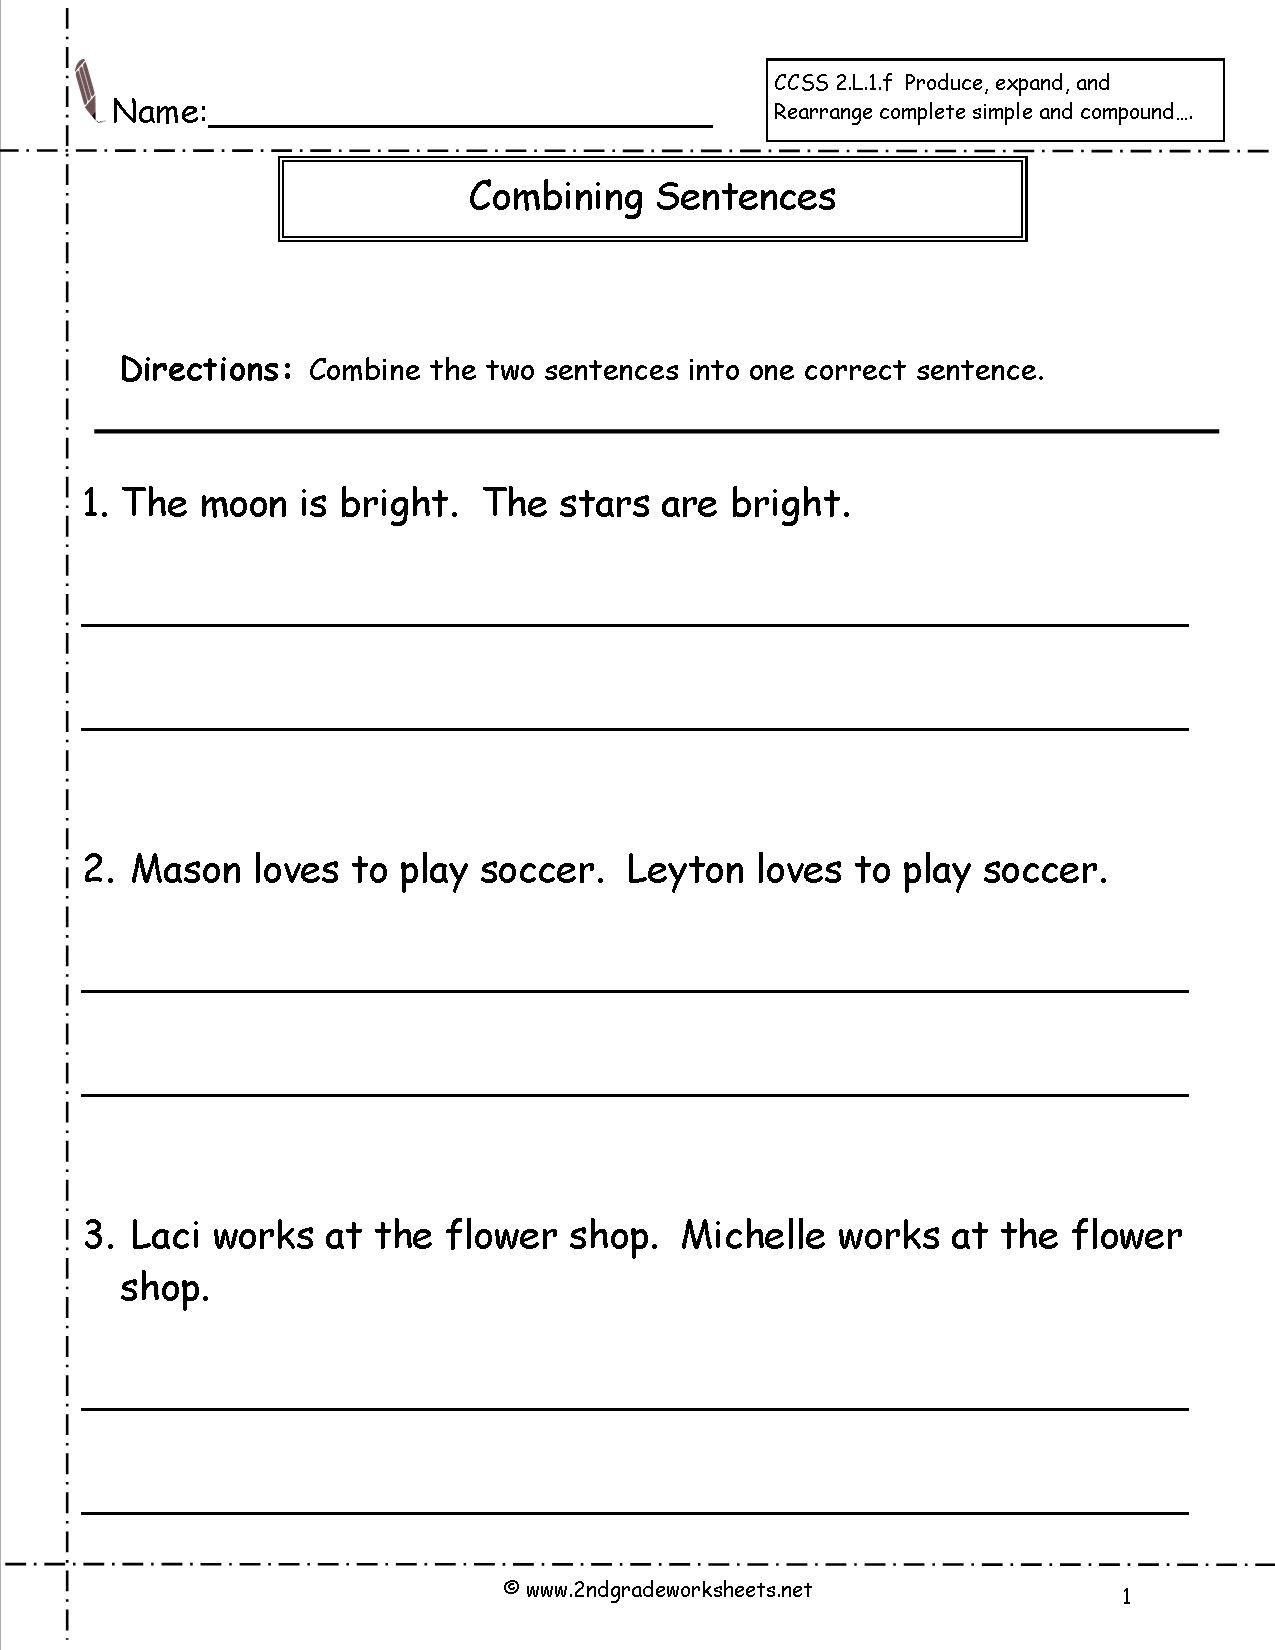 18 Best Images Of 2nd Grade Writing Sentences Worksheets